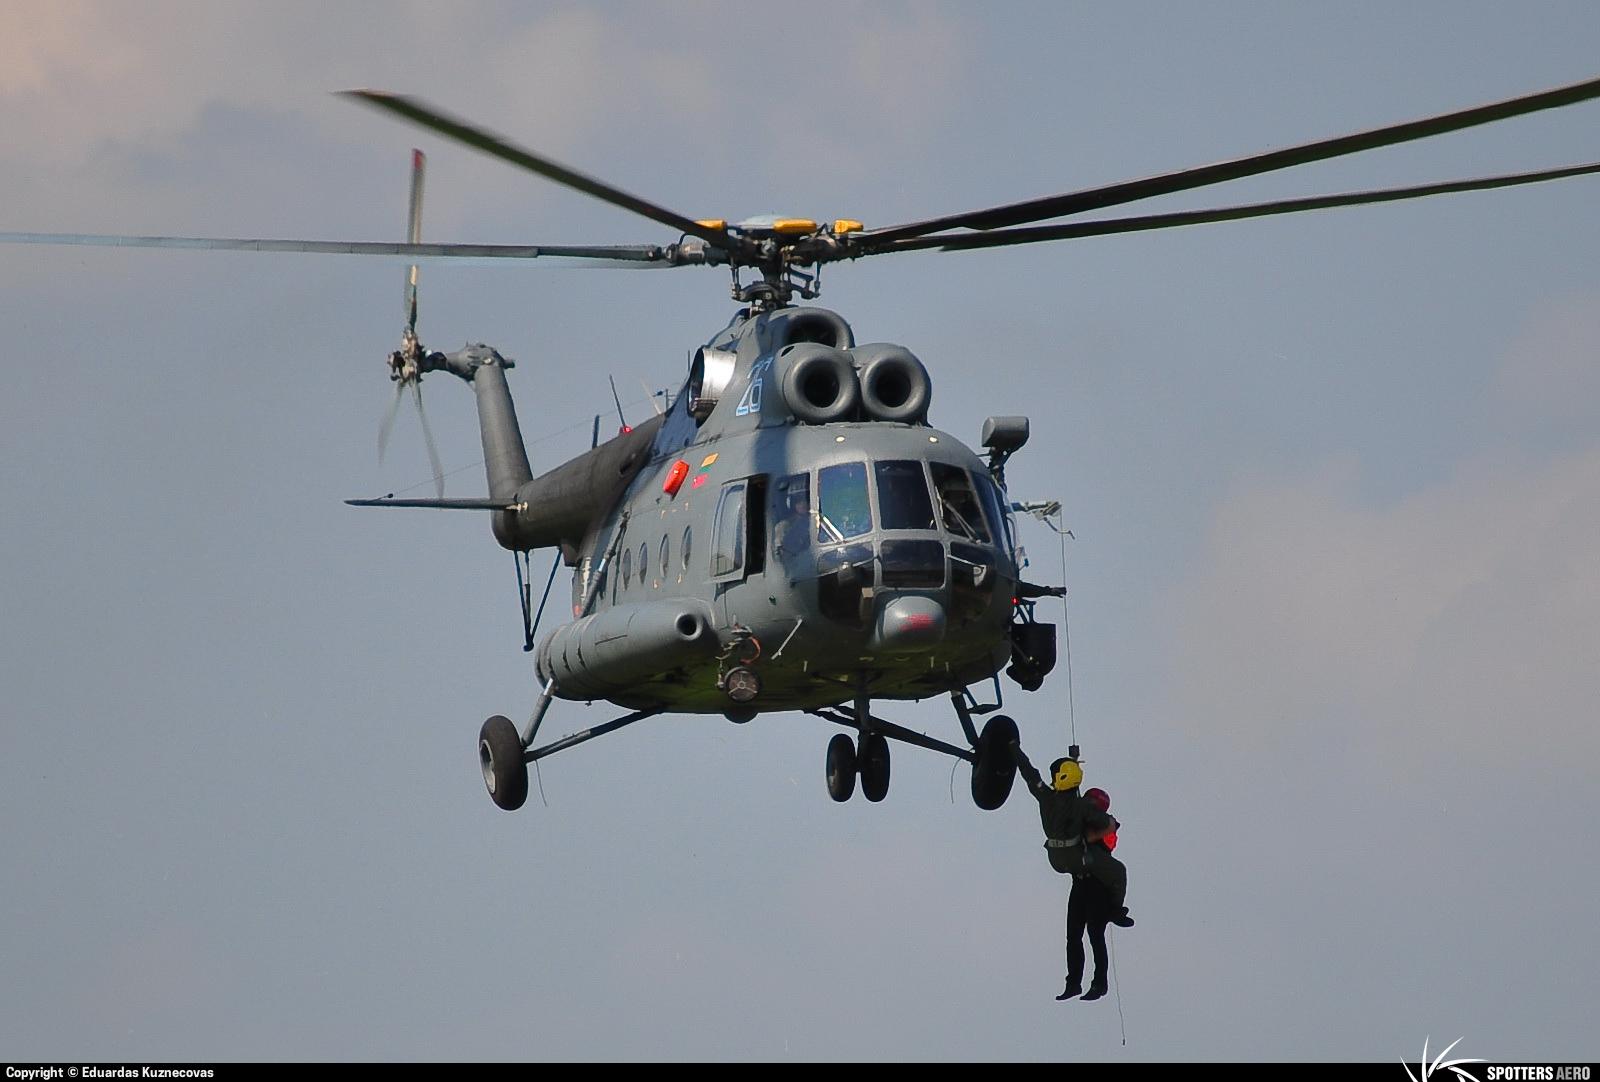 Armée lituanienne/Lithuanian Armed Forces - Page 2 0000033829_large